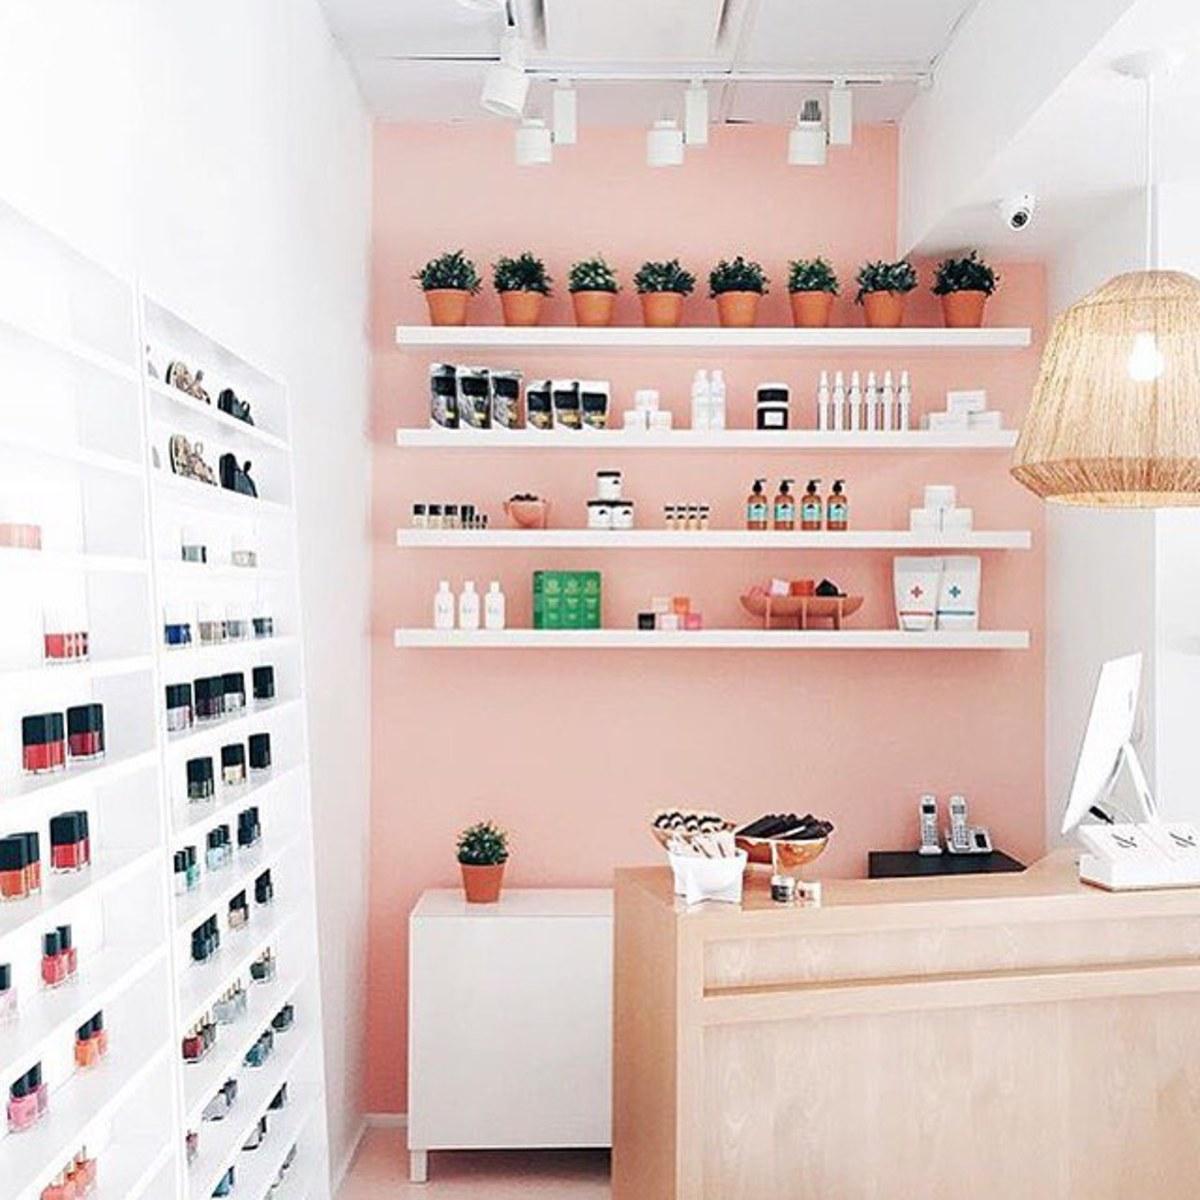 Inside the Olive & June boutique in Pasadena, California. Photo: Facebook